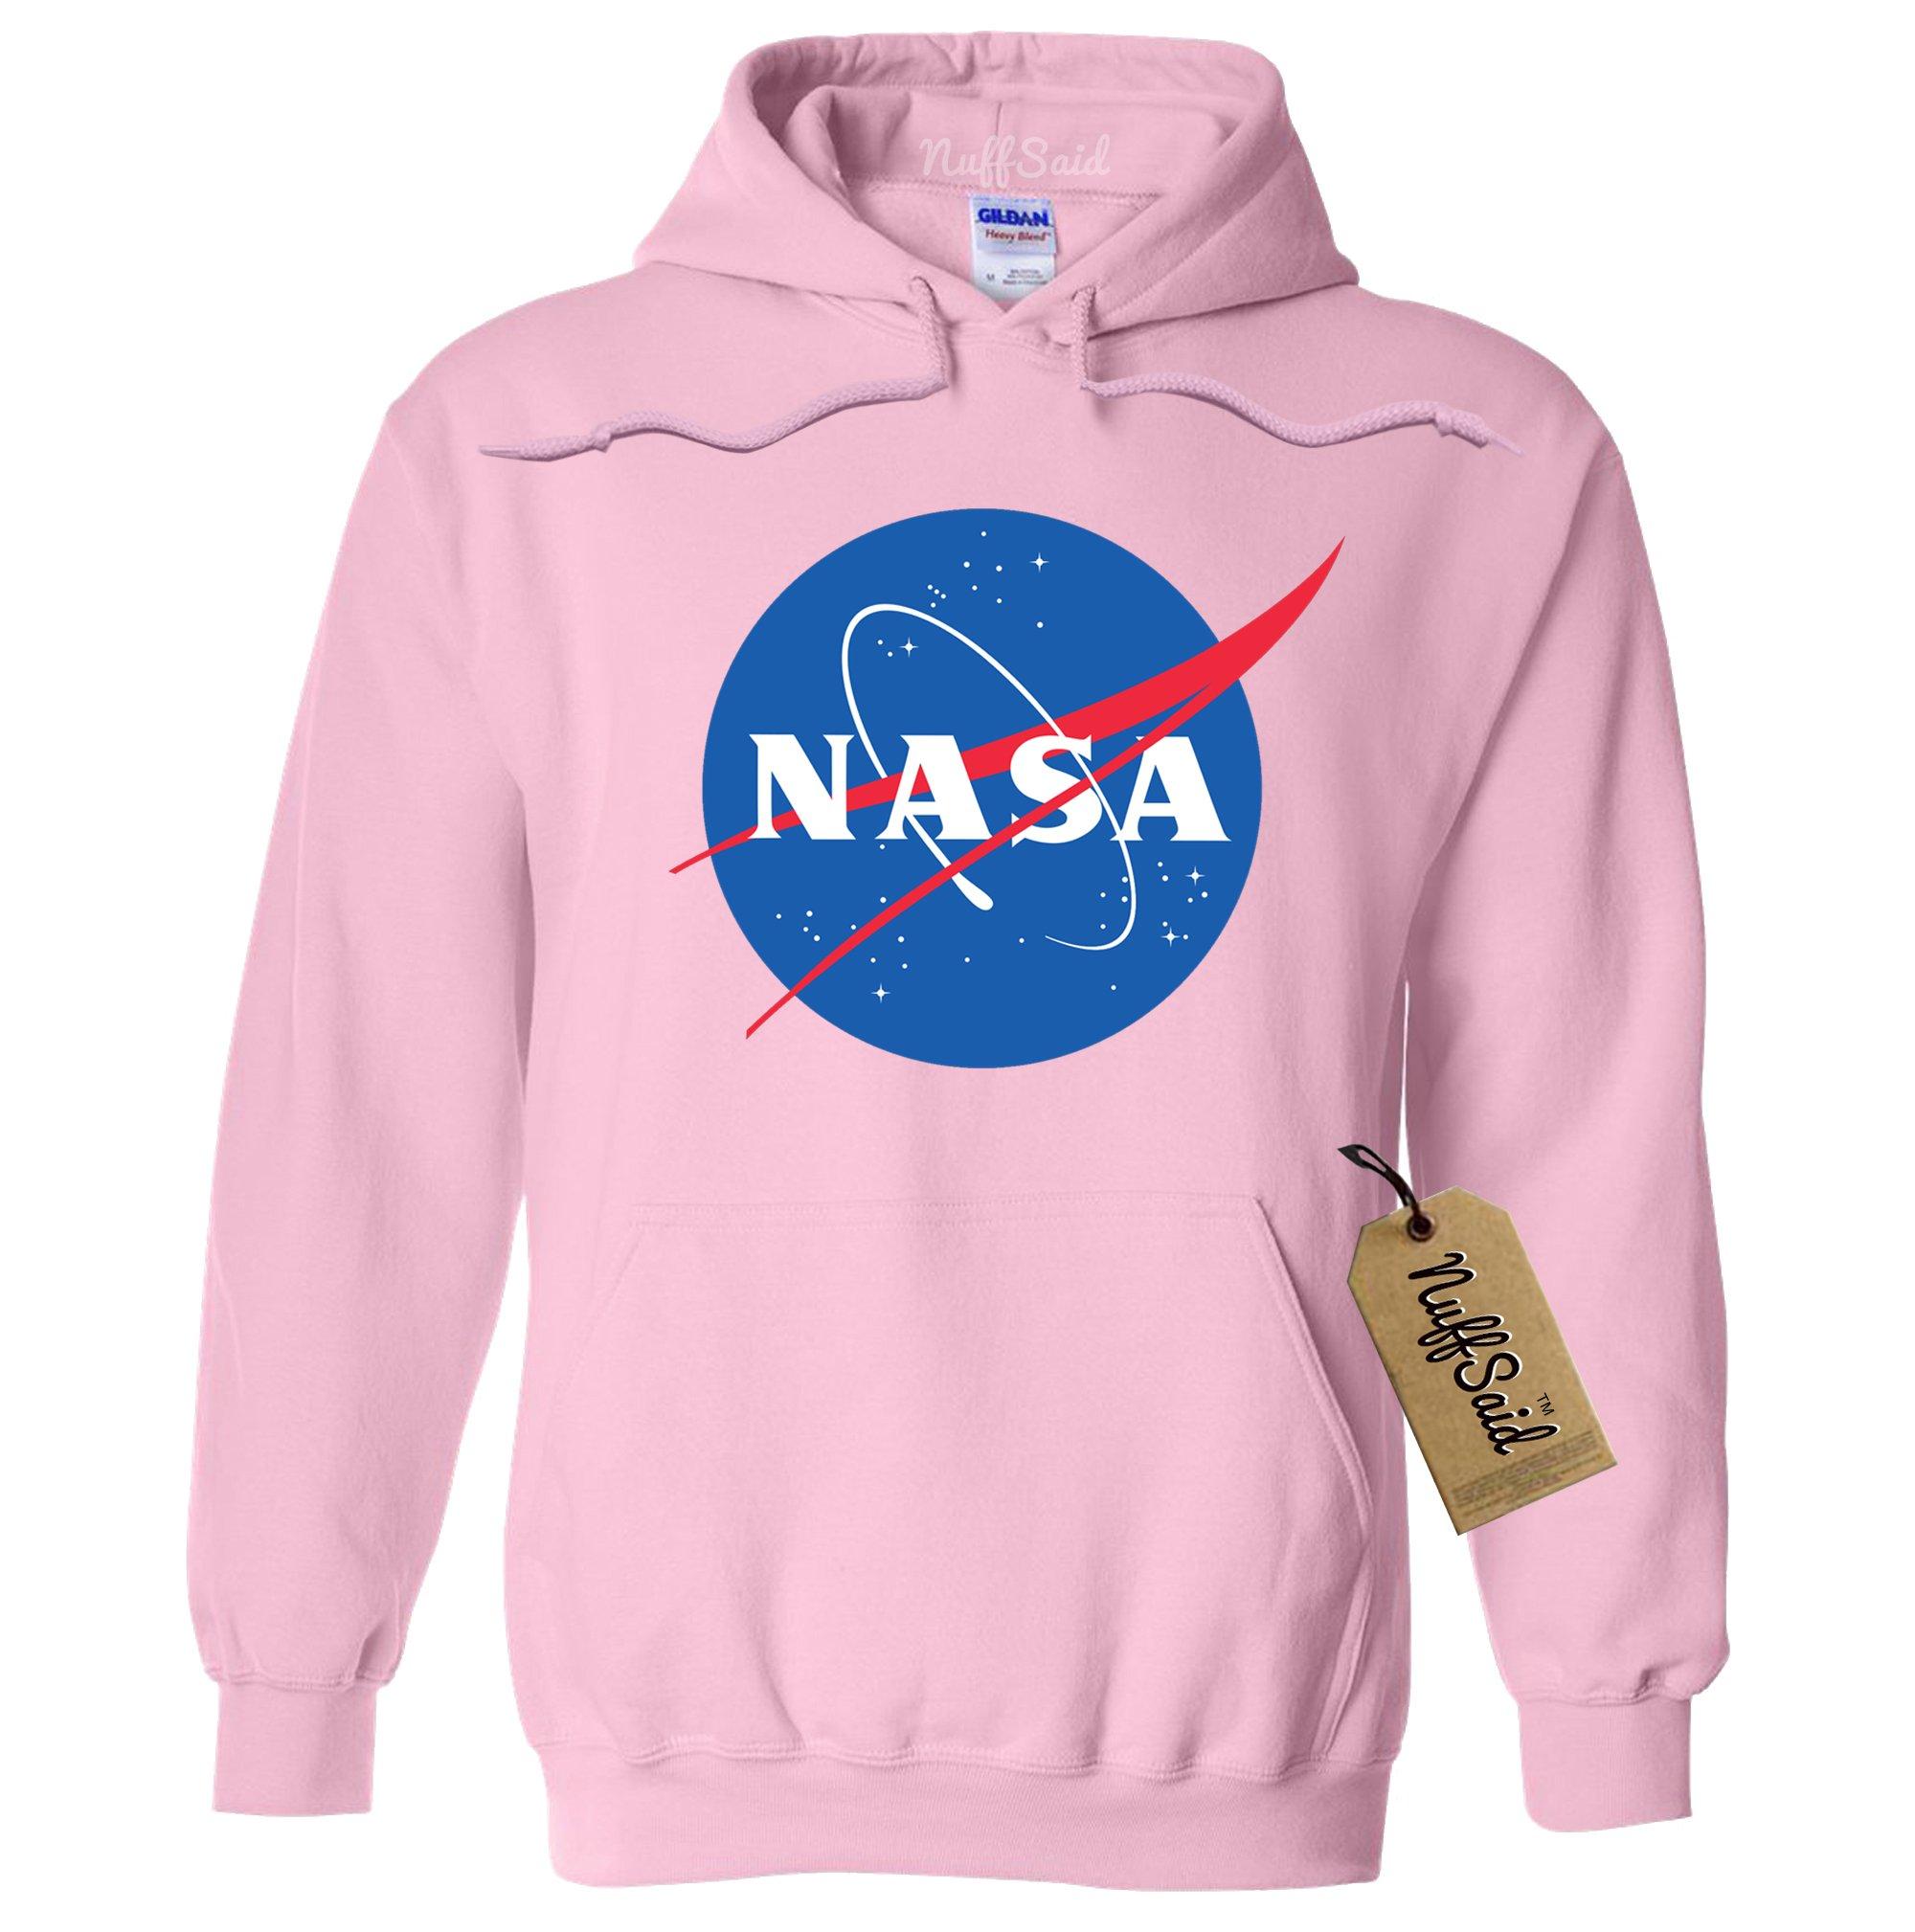 NuffSaid NASA Meatball Logo Worm Hooded Sweatshirt Sweater Pullover - Unisex Hoodie (XLarge, Light Pink)